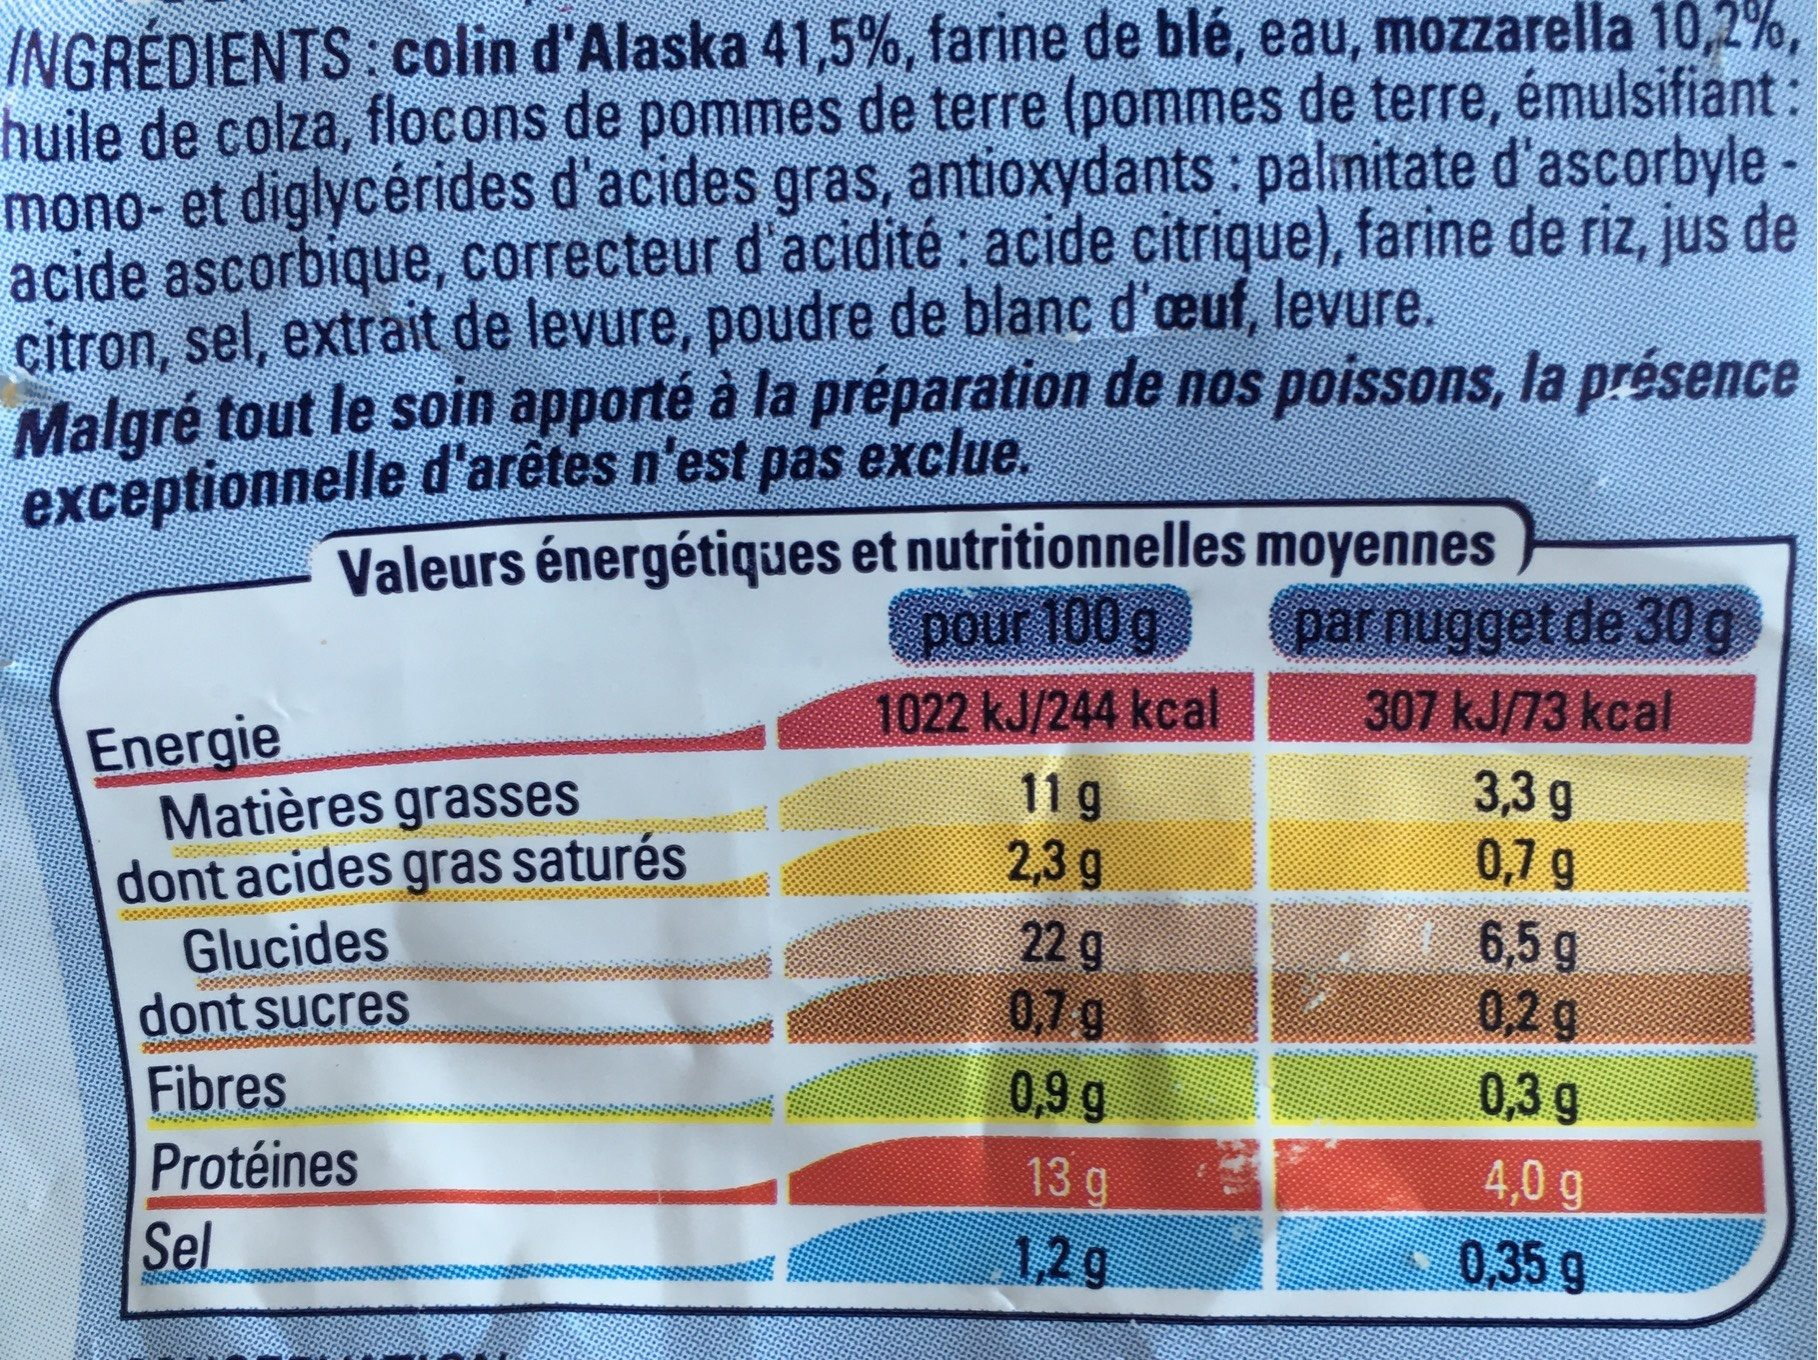 Nuggets de colin d'Alaska et Mozzarella - Nutrition facts - fr